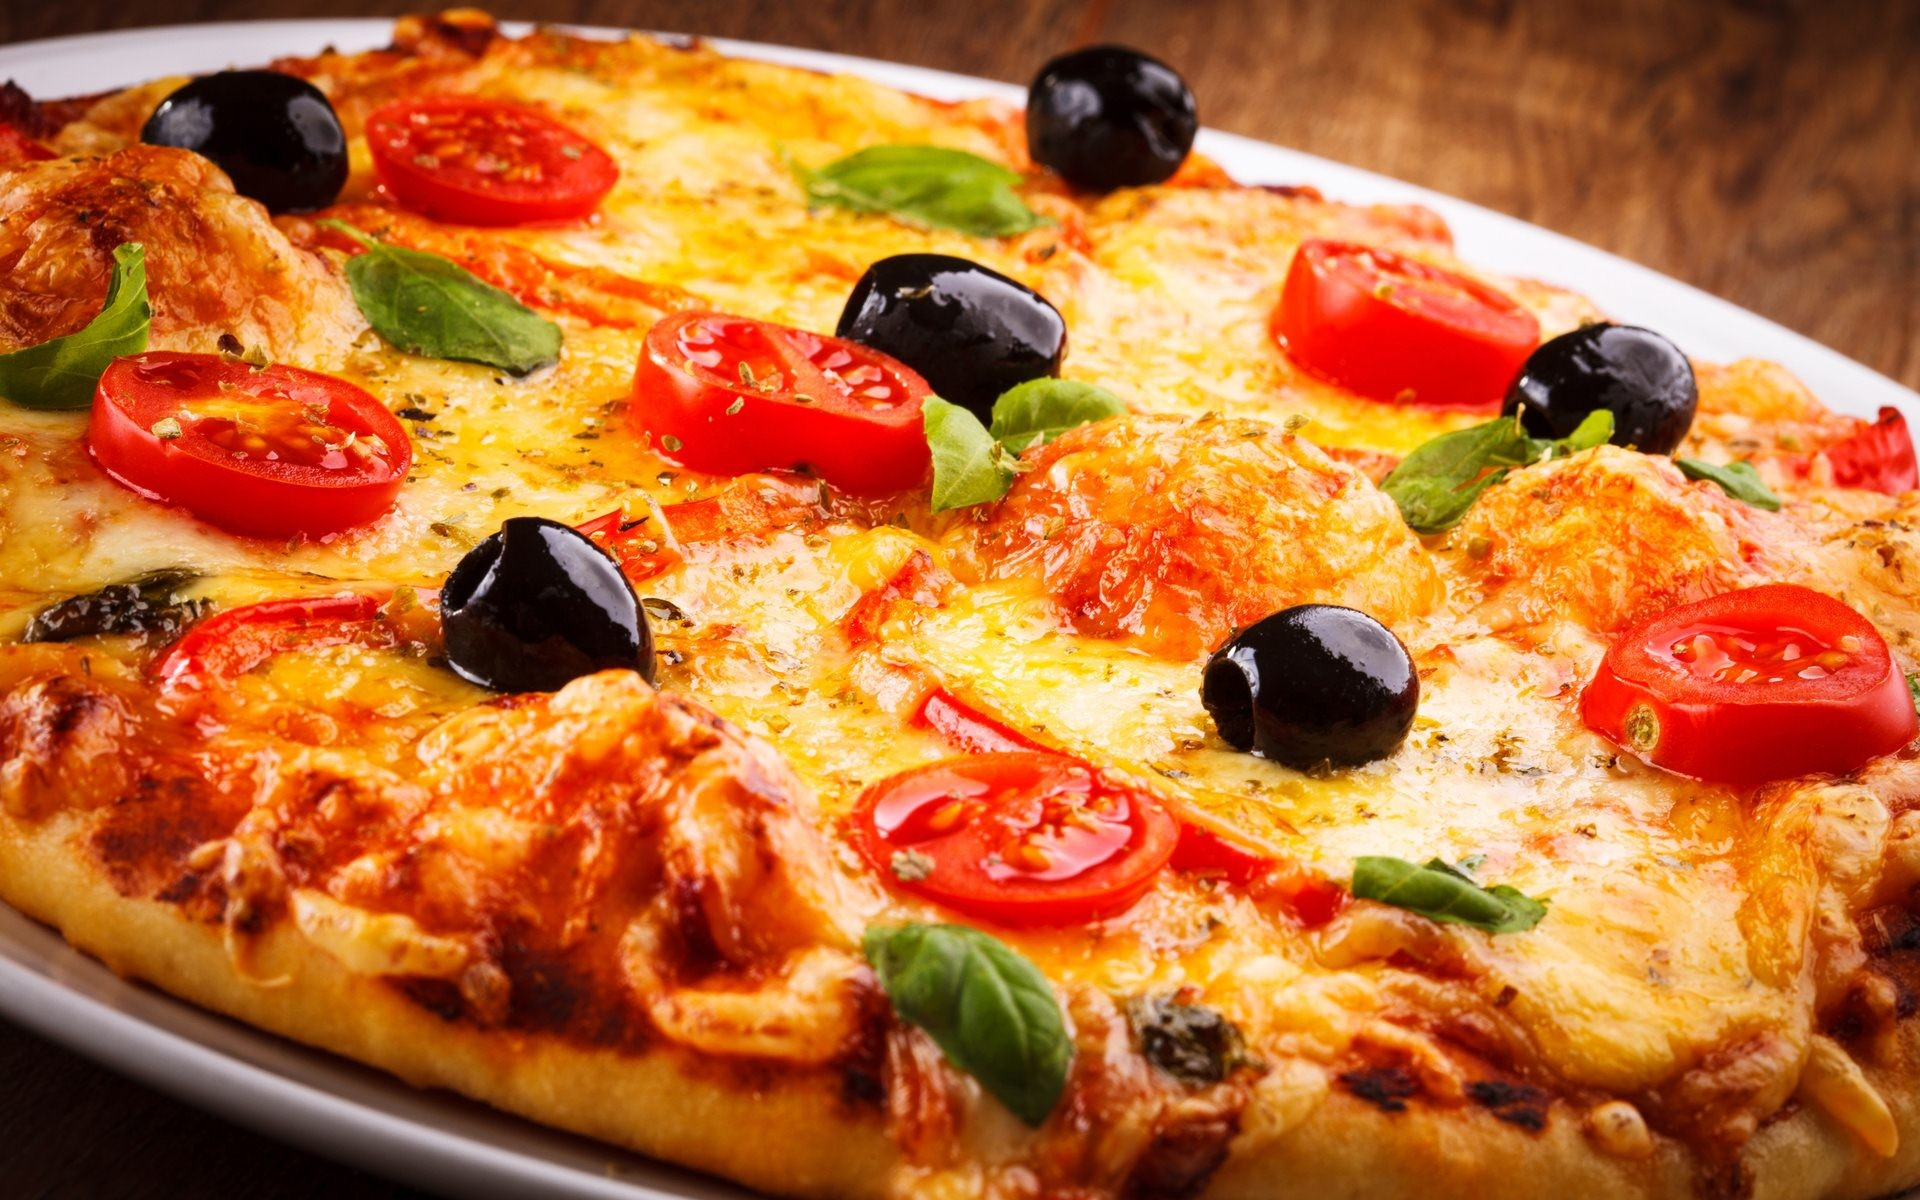 Pizza Wallpaper 183 ① Download Free Hd Wallpapers For Desktop